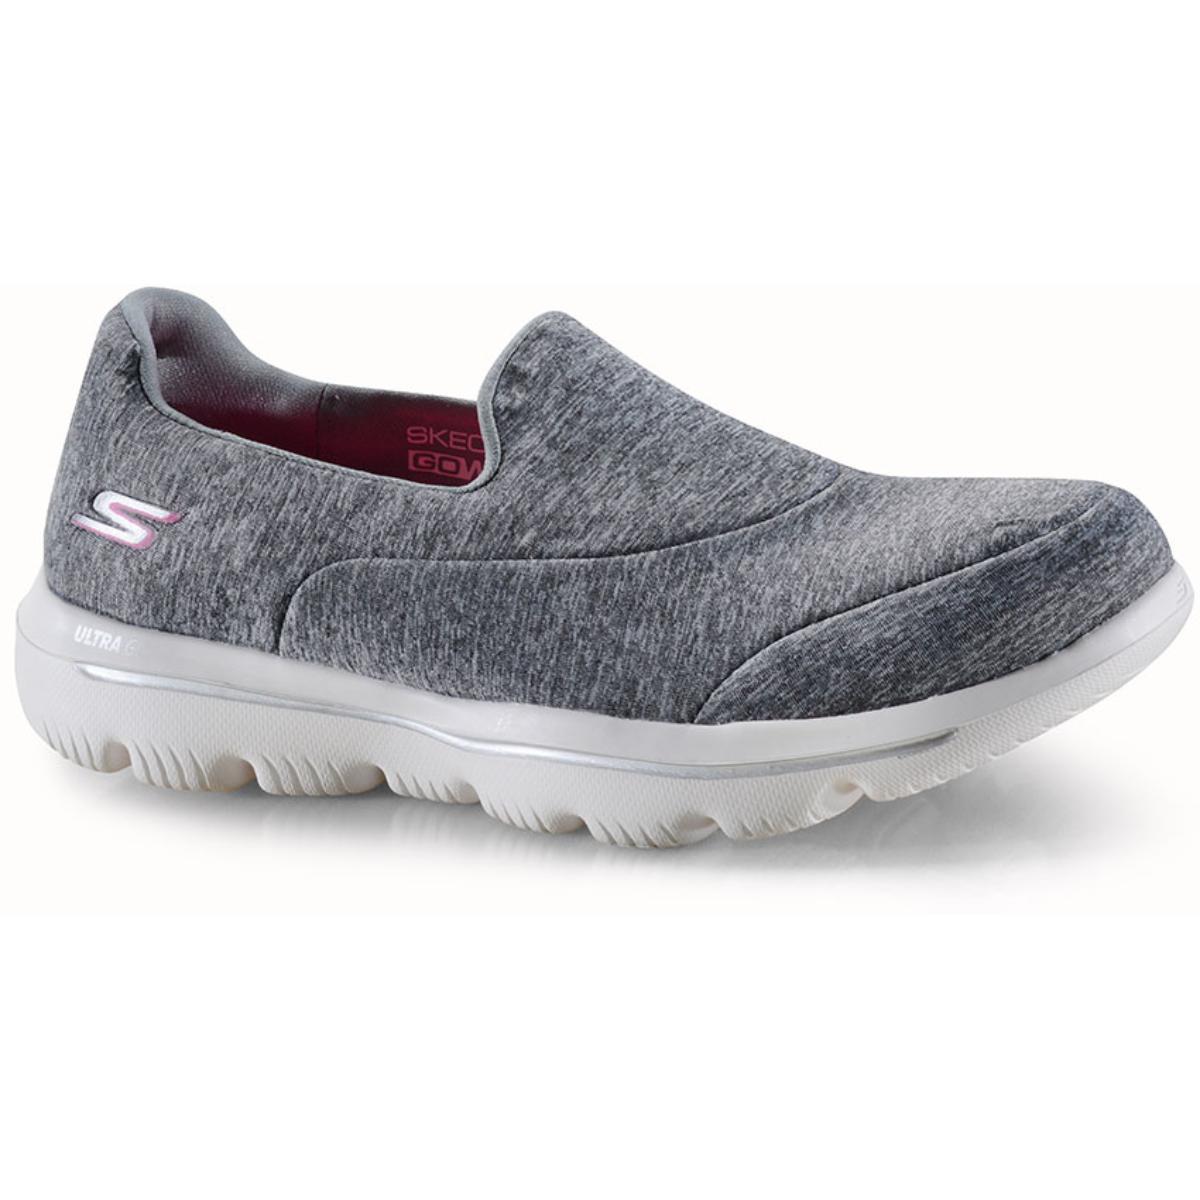 Tênis Feminino Skechers 15733 Gry go Walk Evolution Ultramaze Cinza